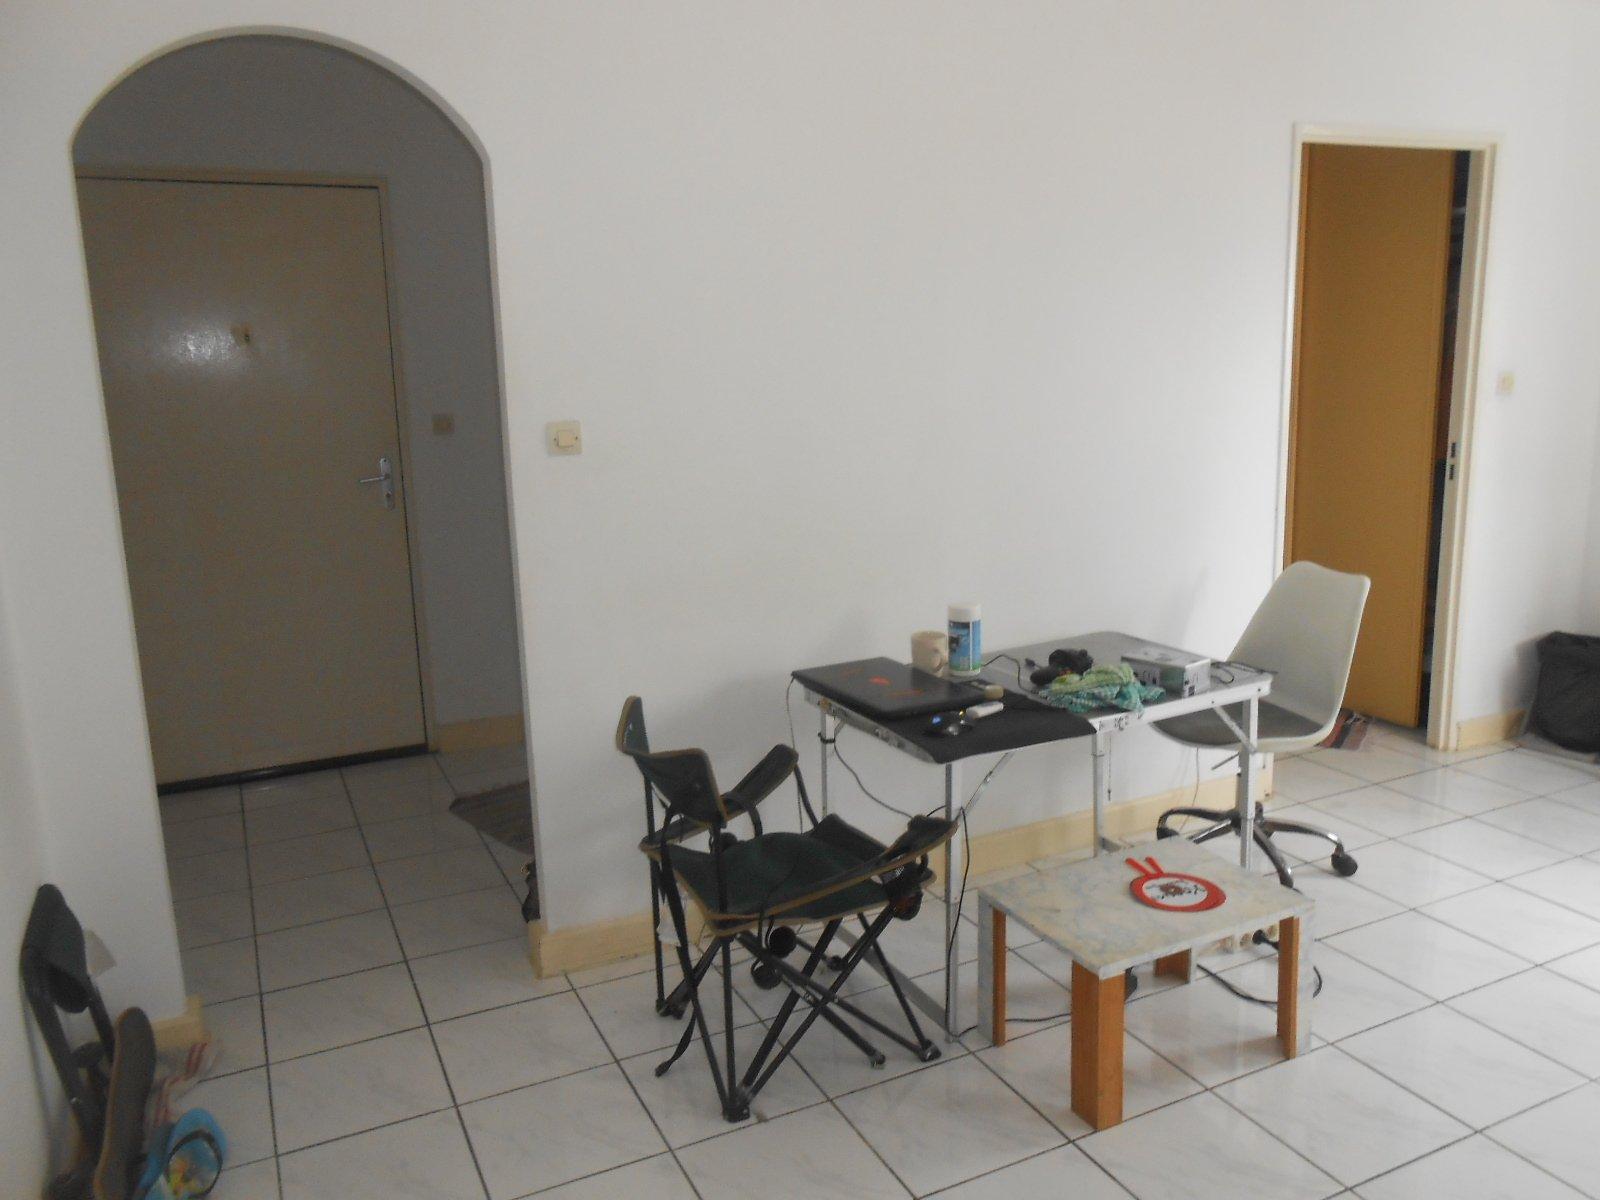 Achat studio sainte clotilde 97490 r union nord r f 3961r for Achat studio